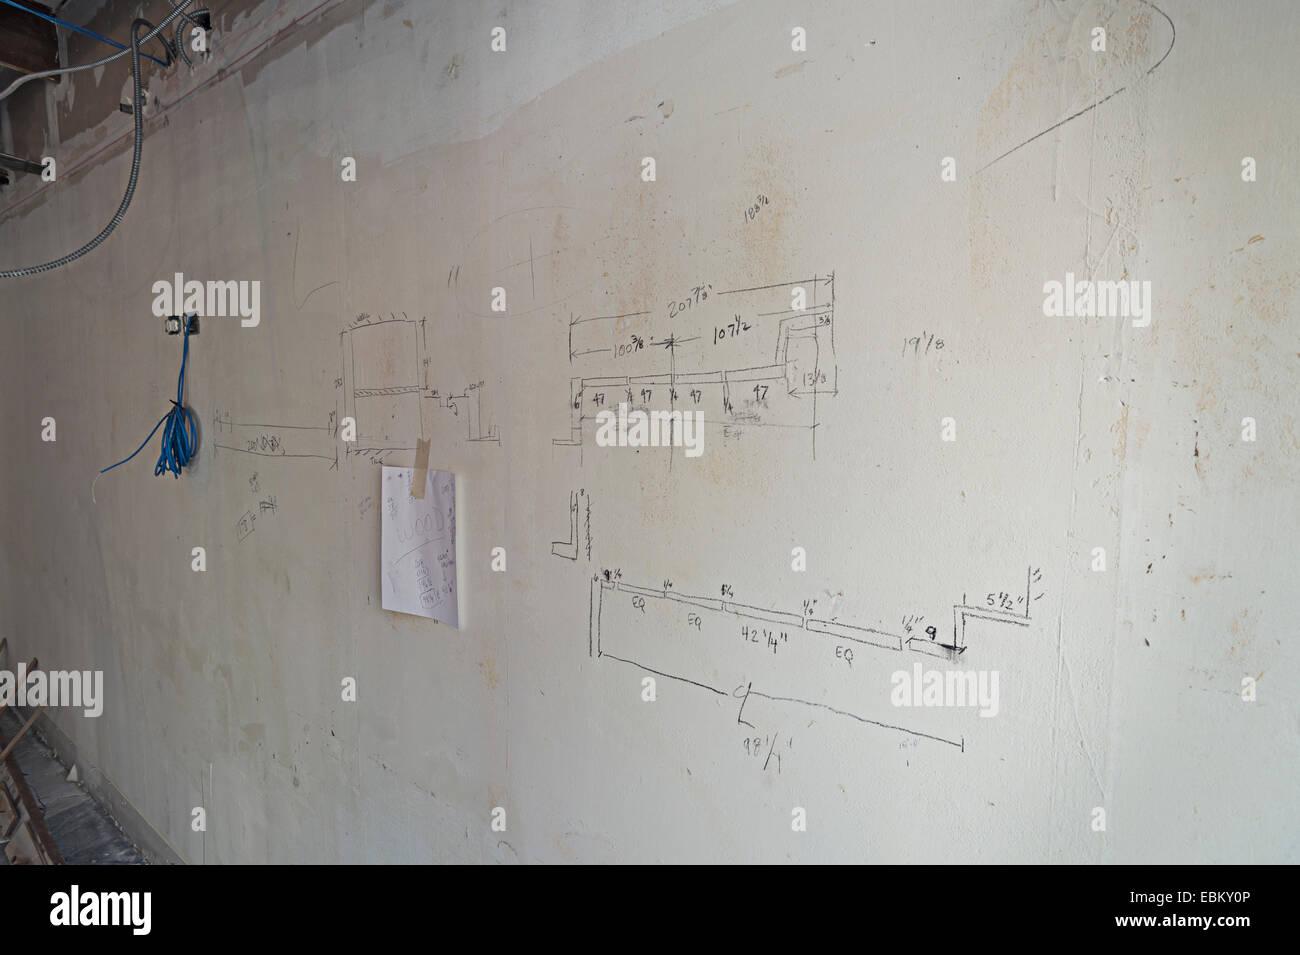 Des Auftragnehmers kritzeln Zeichnungen an Wand Stockbild